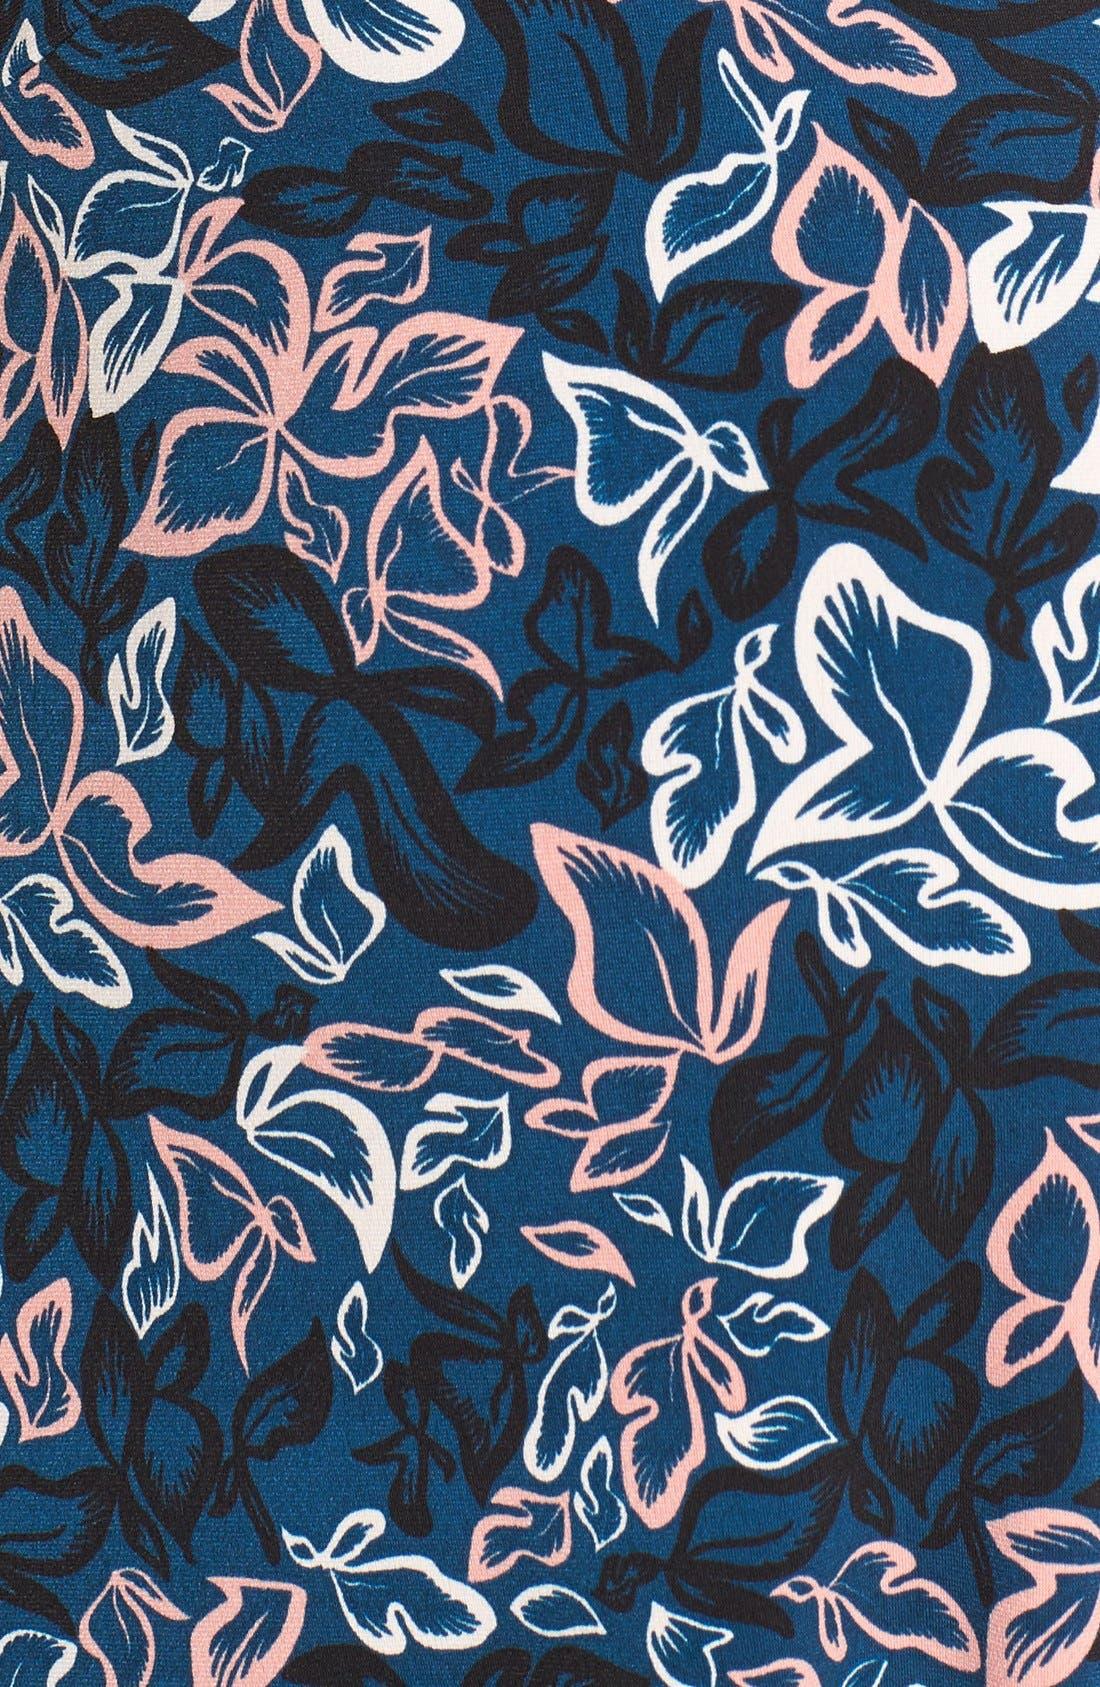 'Sweetheart' Maternity Dress,                             Alternate thumbnail 4, color,                             405